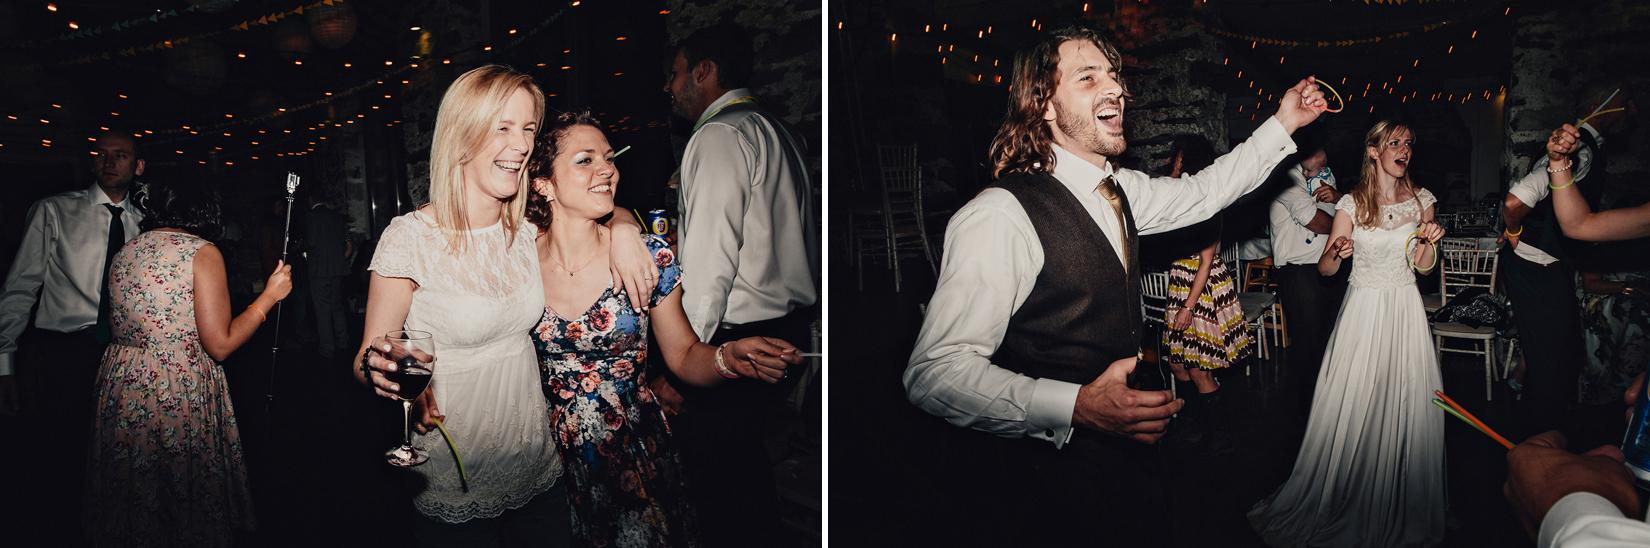 deb-ant-wedding-dance.jpg